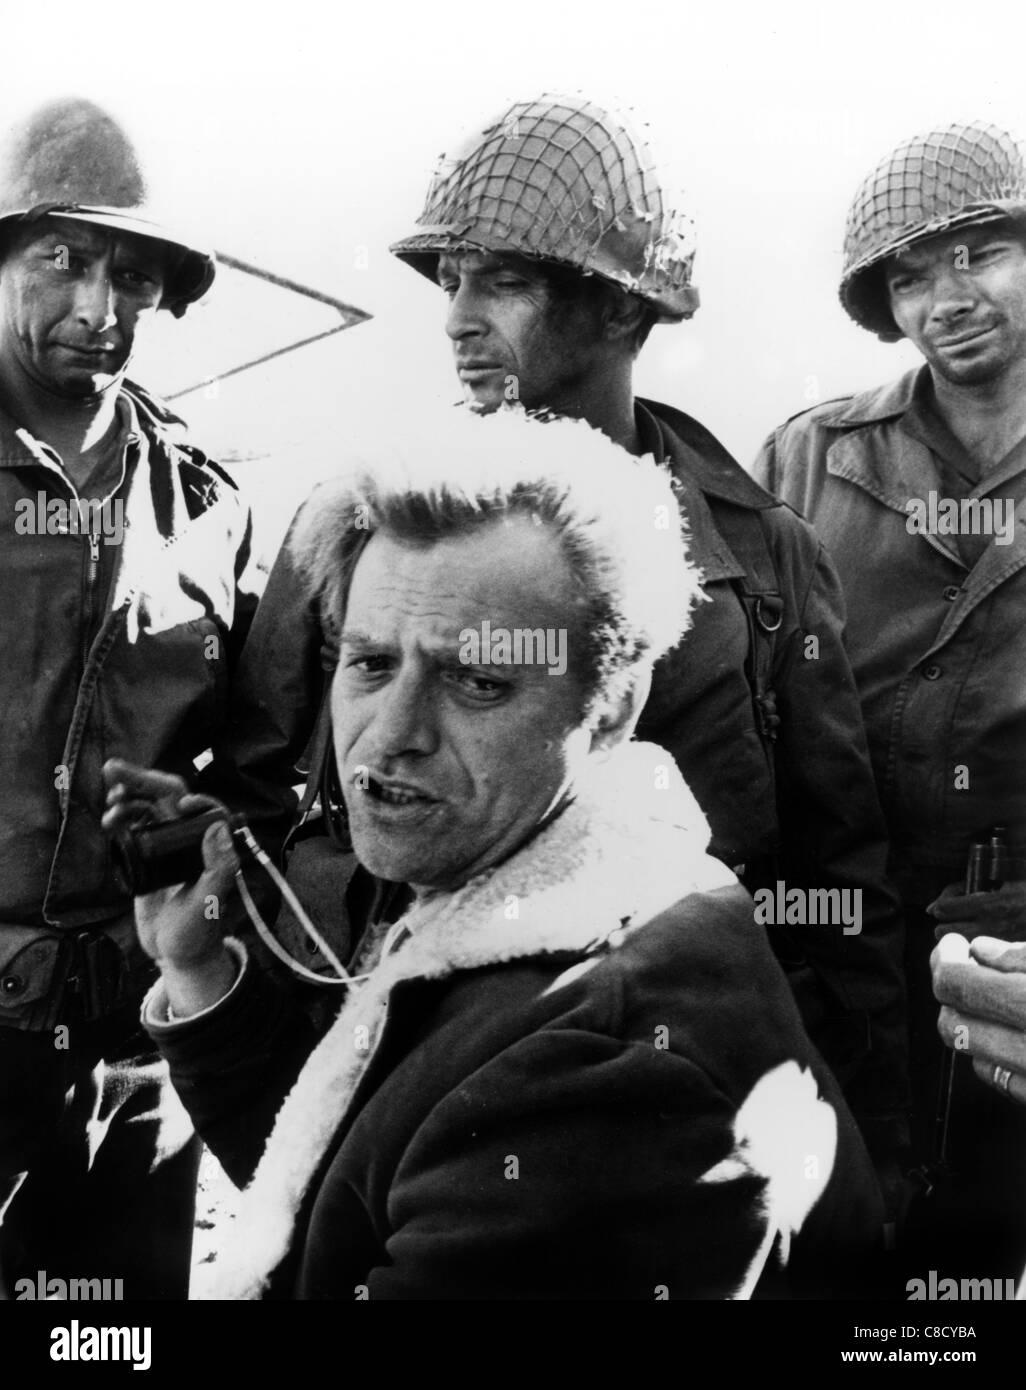 VIC MORROW COMBAT! (1962) - Stock Image